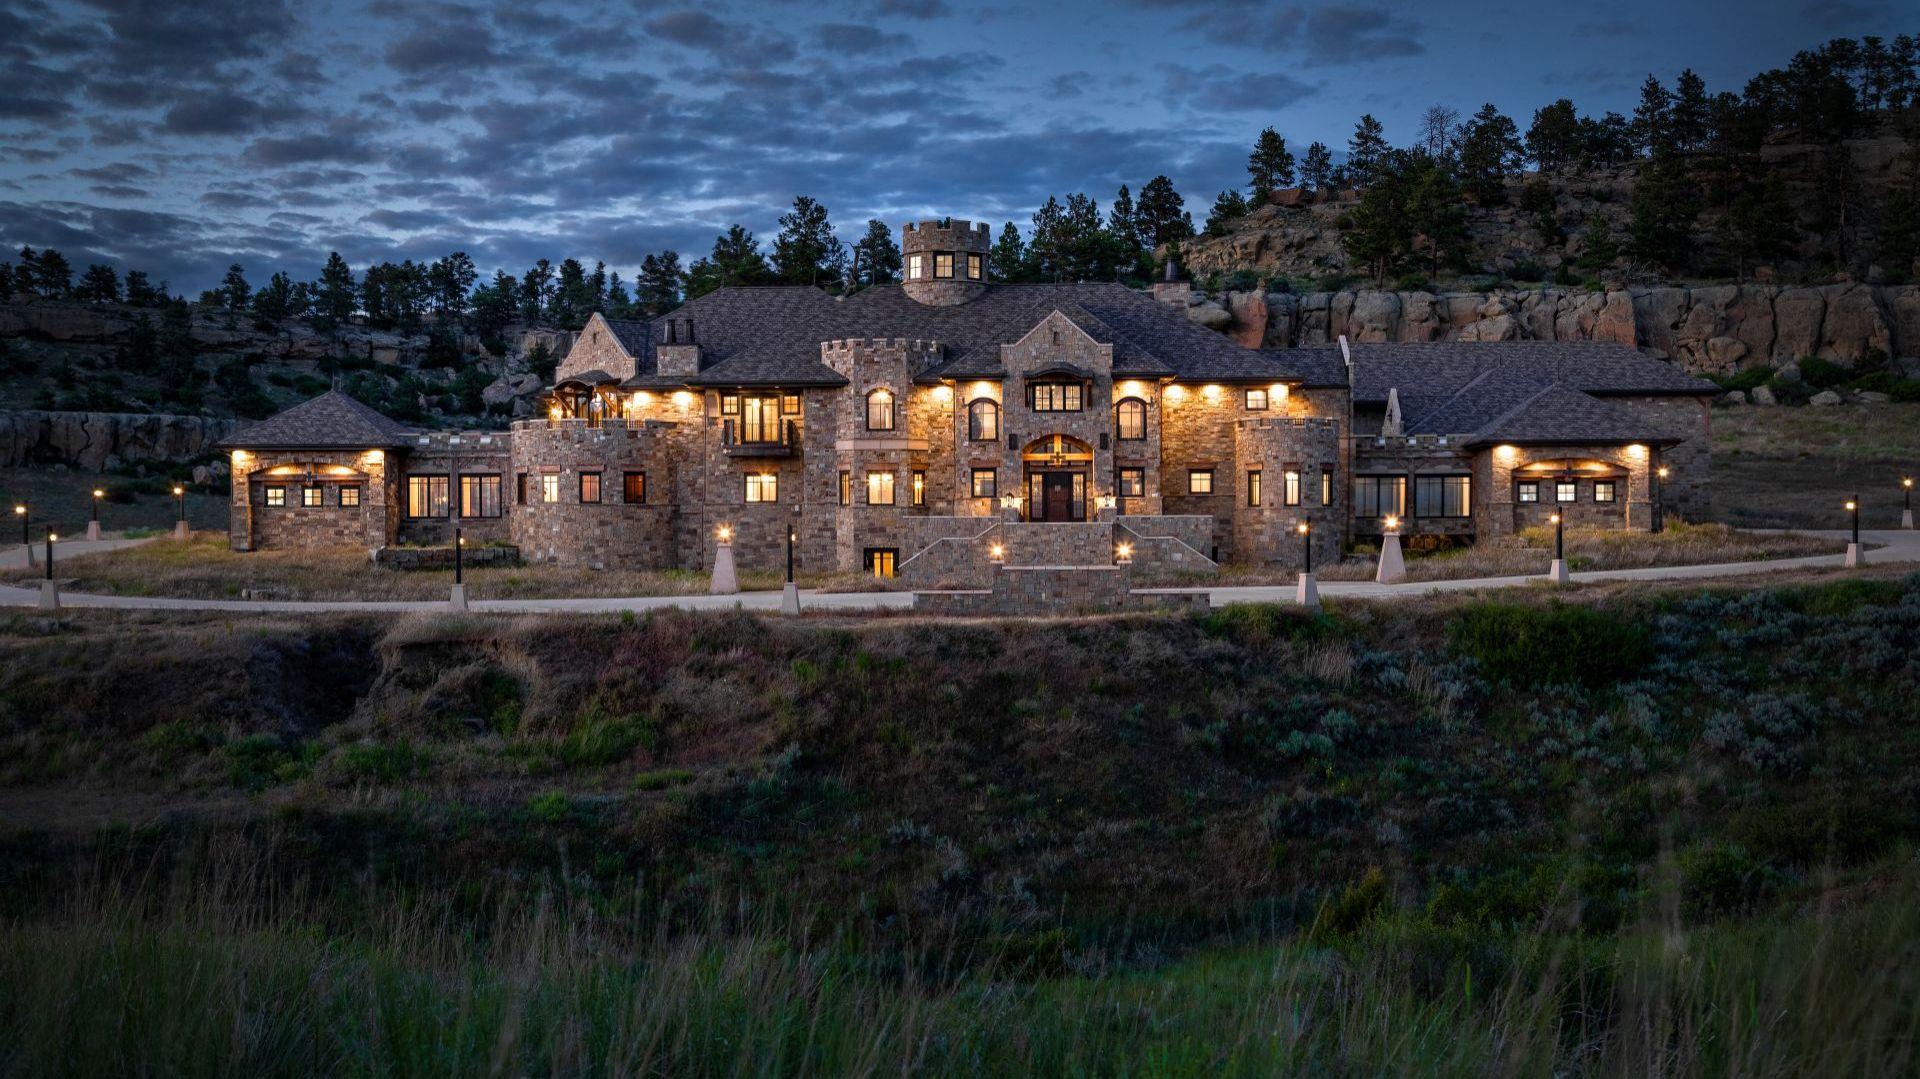 Zamek w Montanie. Źródło: Top Ten Real Estate Deals. Zdjęcia: Engel & Volkers